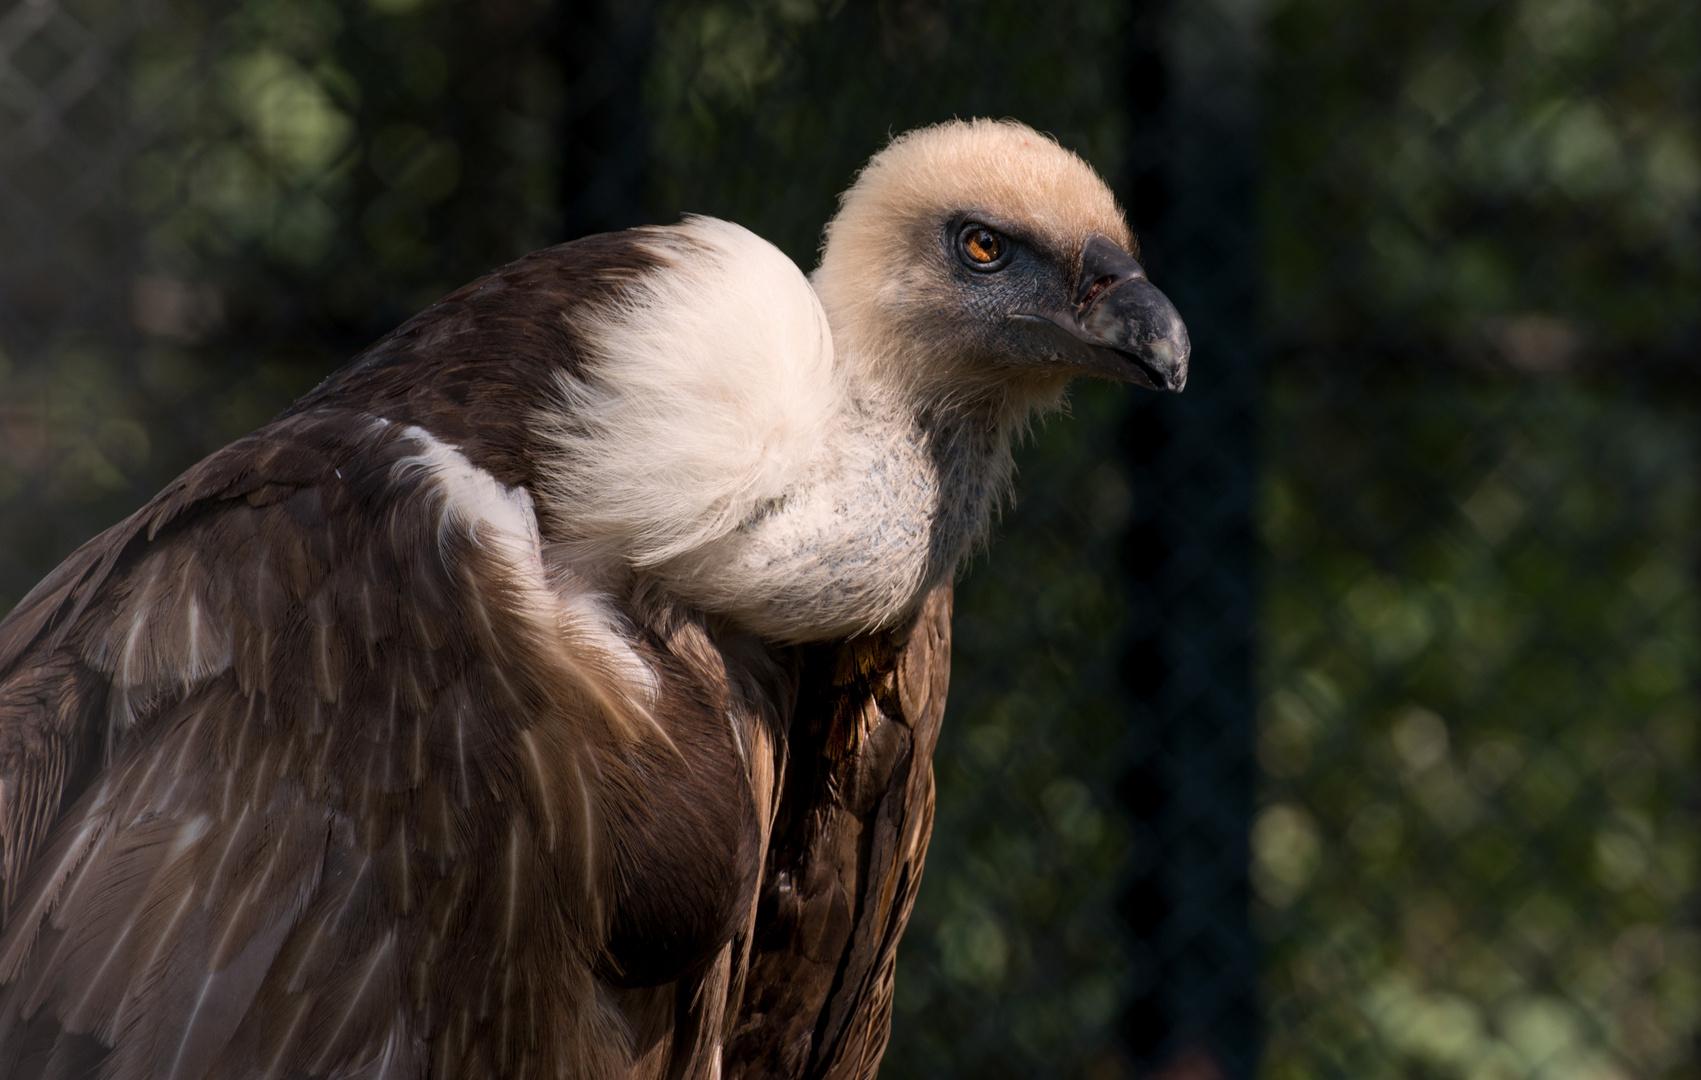 Griffon Vulture - Gänsegeier